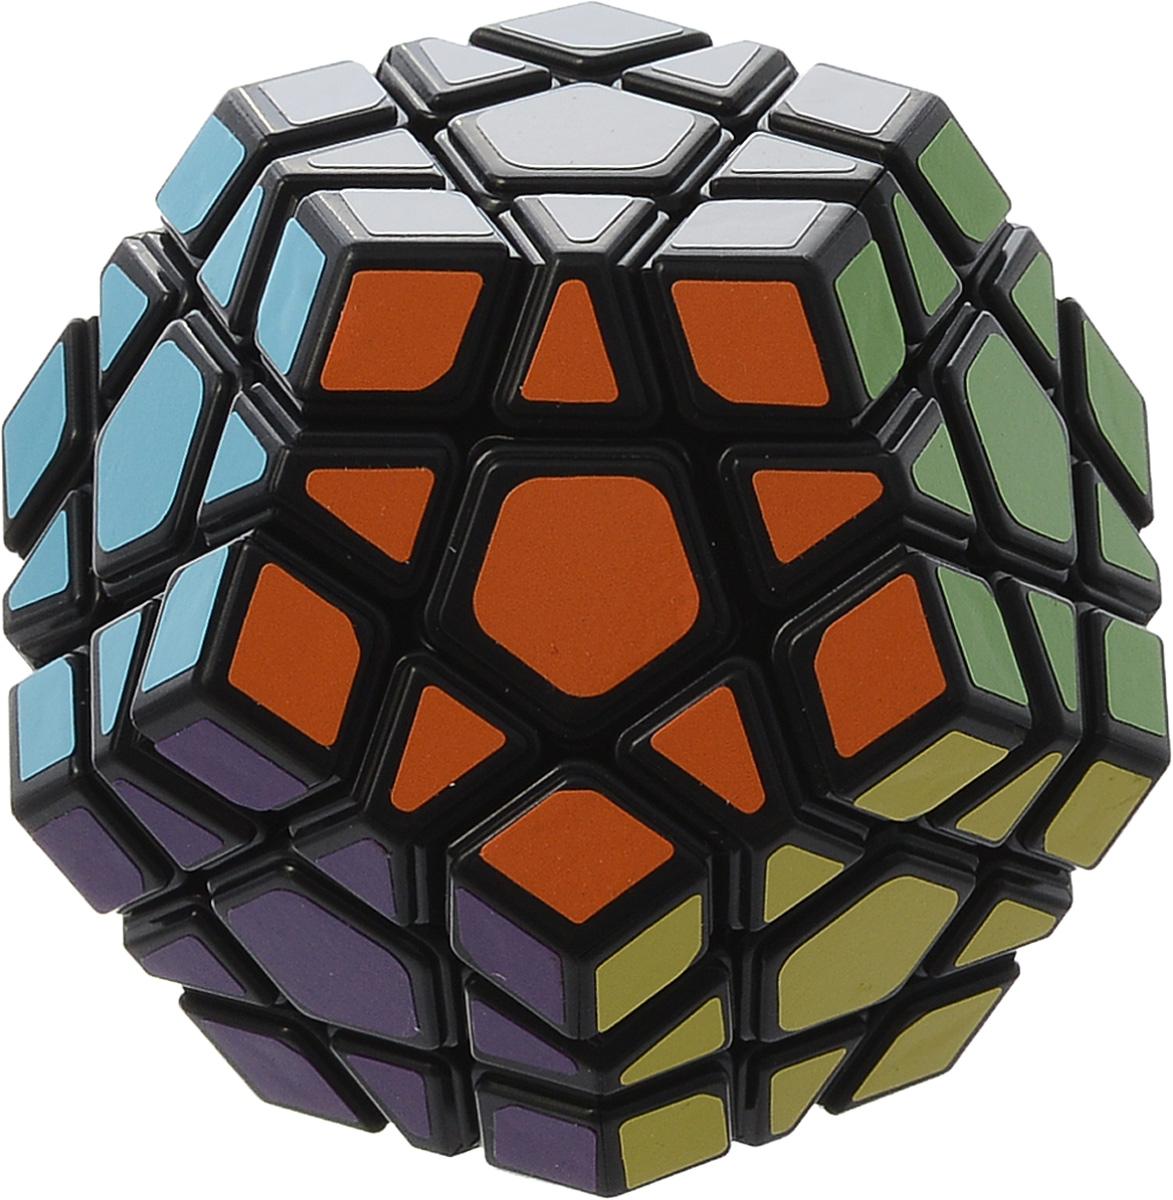 цена Головоломка Junfa Toys Кубикубс, ZY761148 онлайн в 2017 году